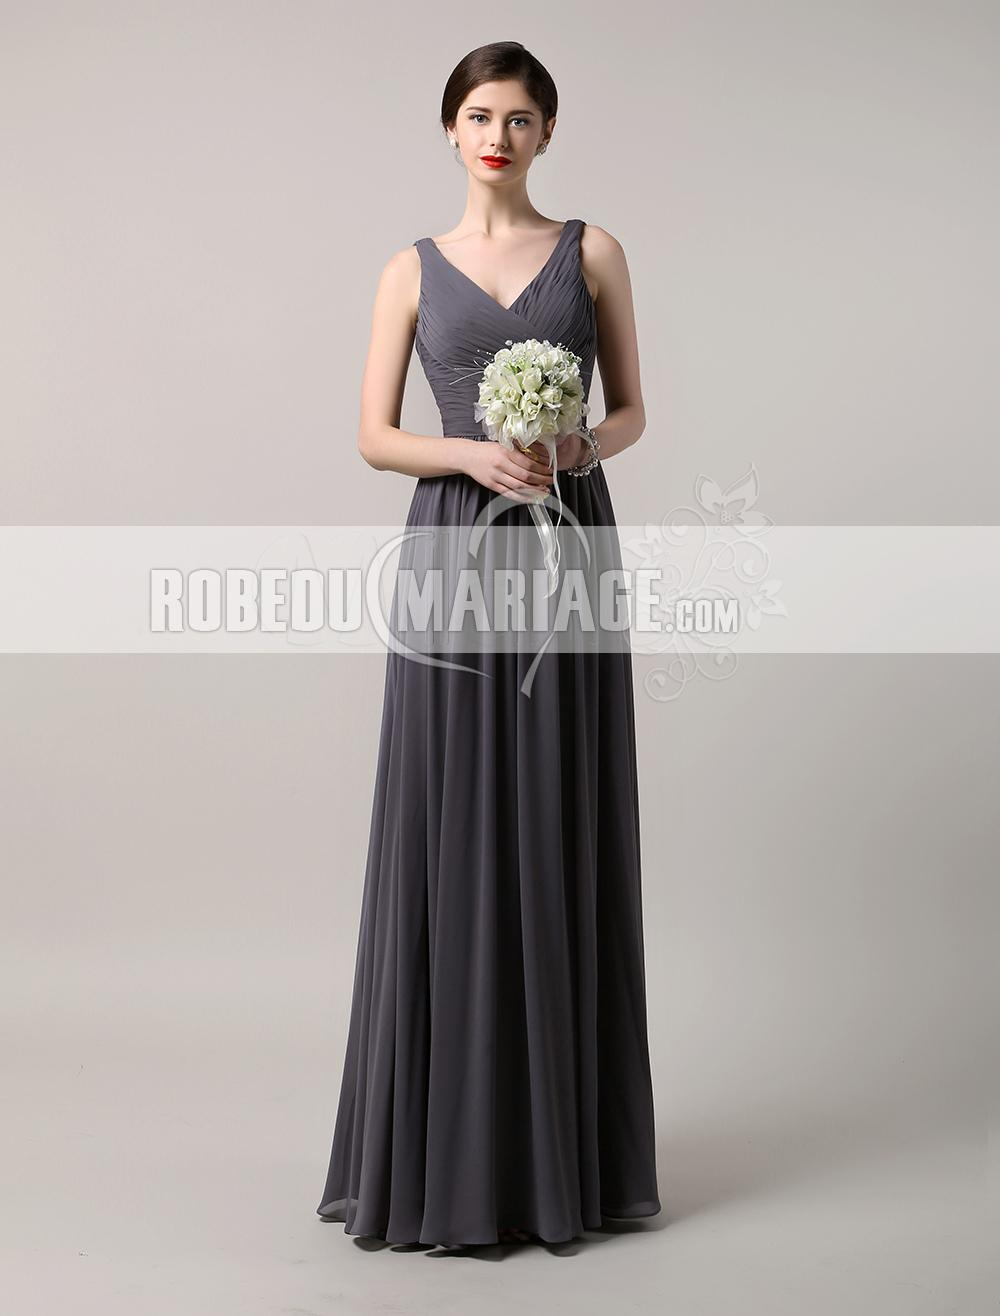 robe de demoiselle d 39 honneur pour mariage col en v robe en chiffon robe2012426. Black Bedroom Furniture Sets. Home Design Ideas